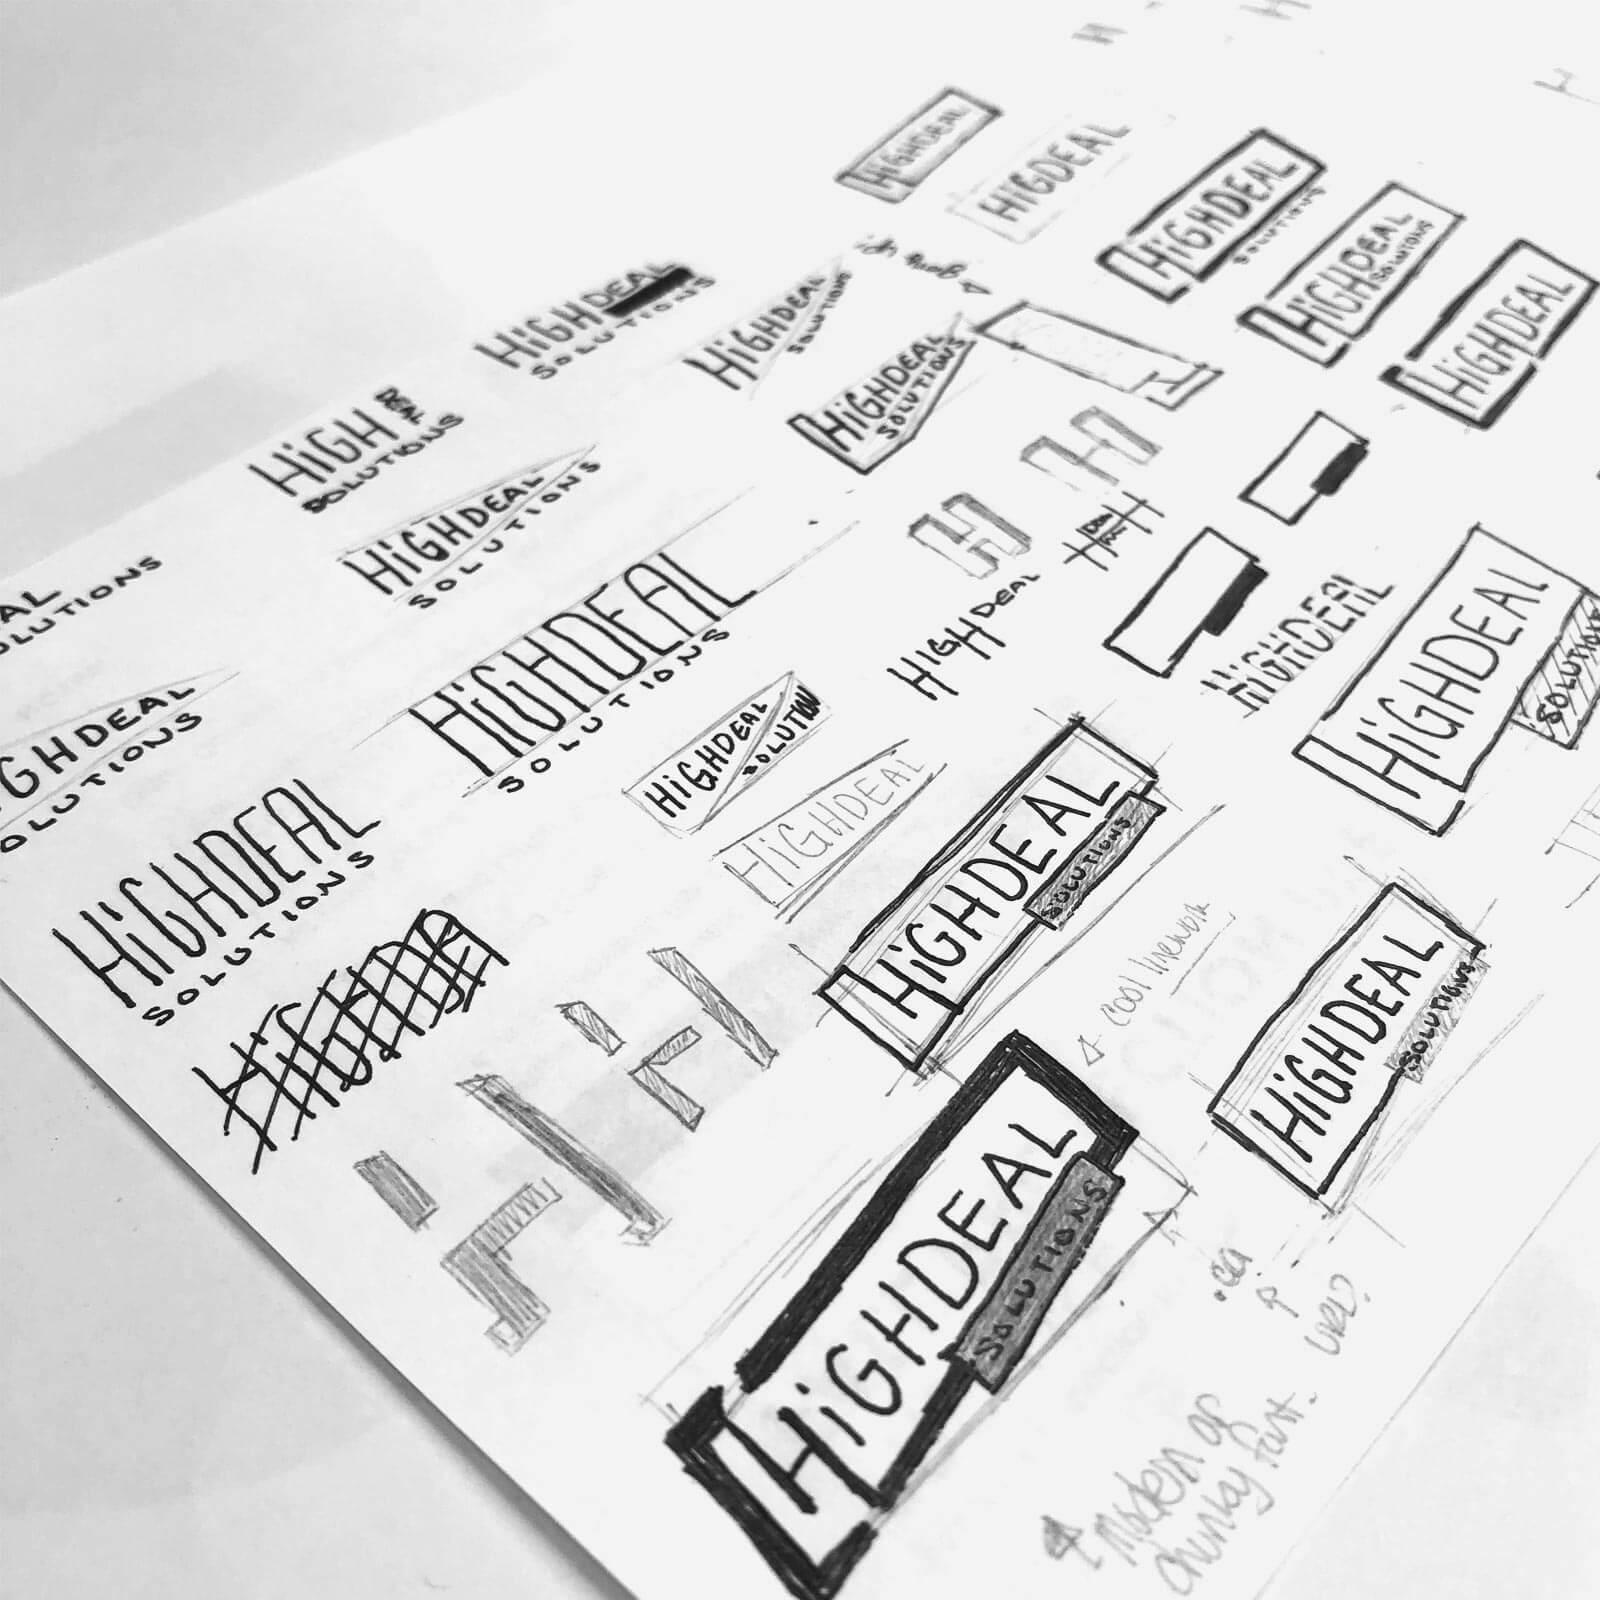 Y5 Creative Case Studies Highdeal Work Process 2